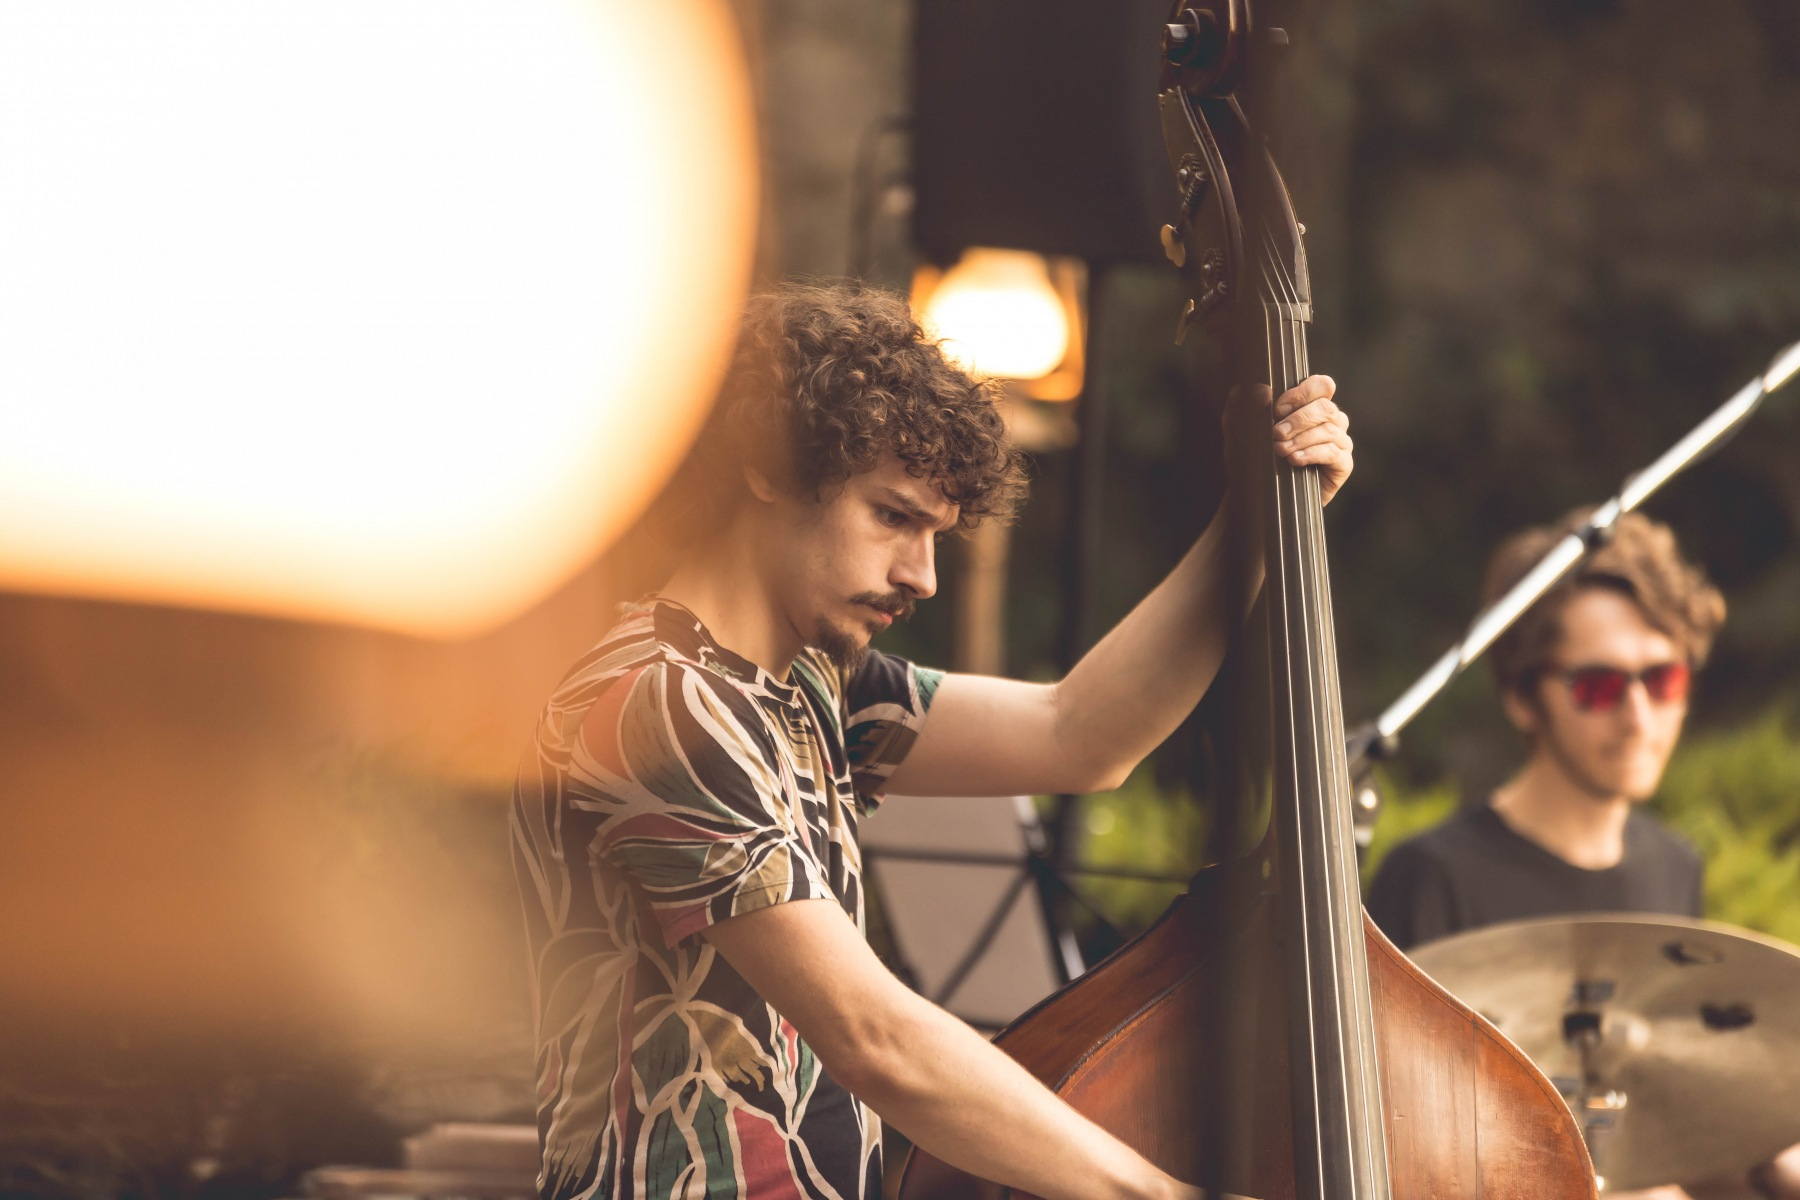 Michael Acker on Upright bass